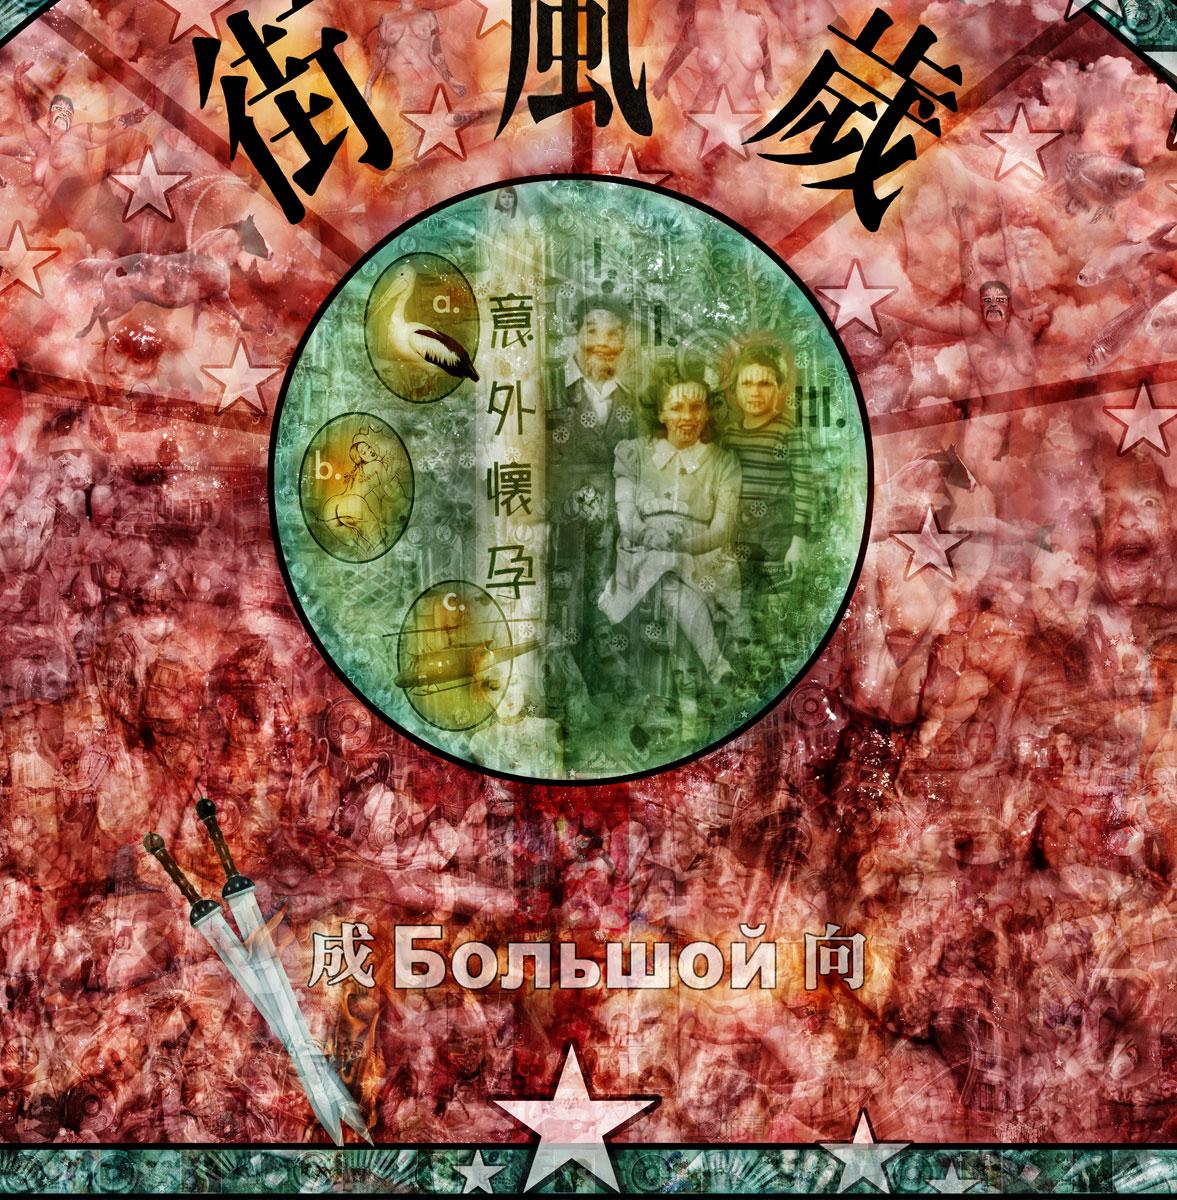 The Euphoric Exaltation of the Divine Purge AKA The Burial Id